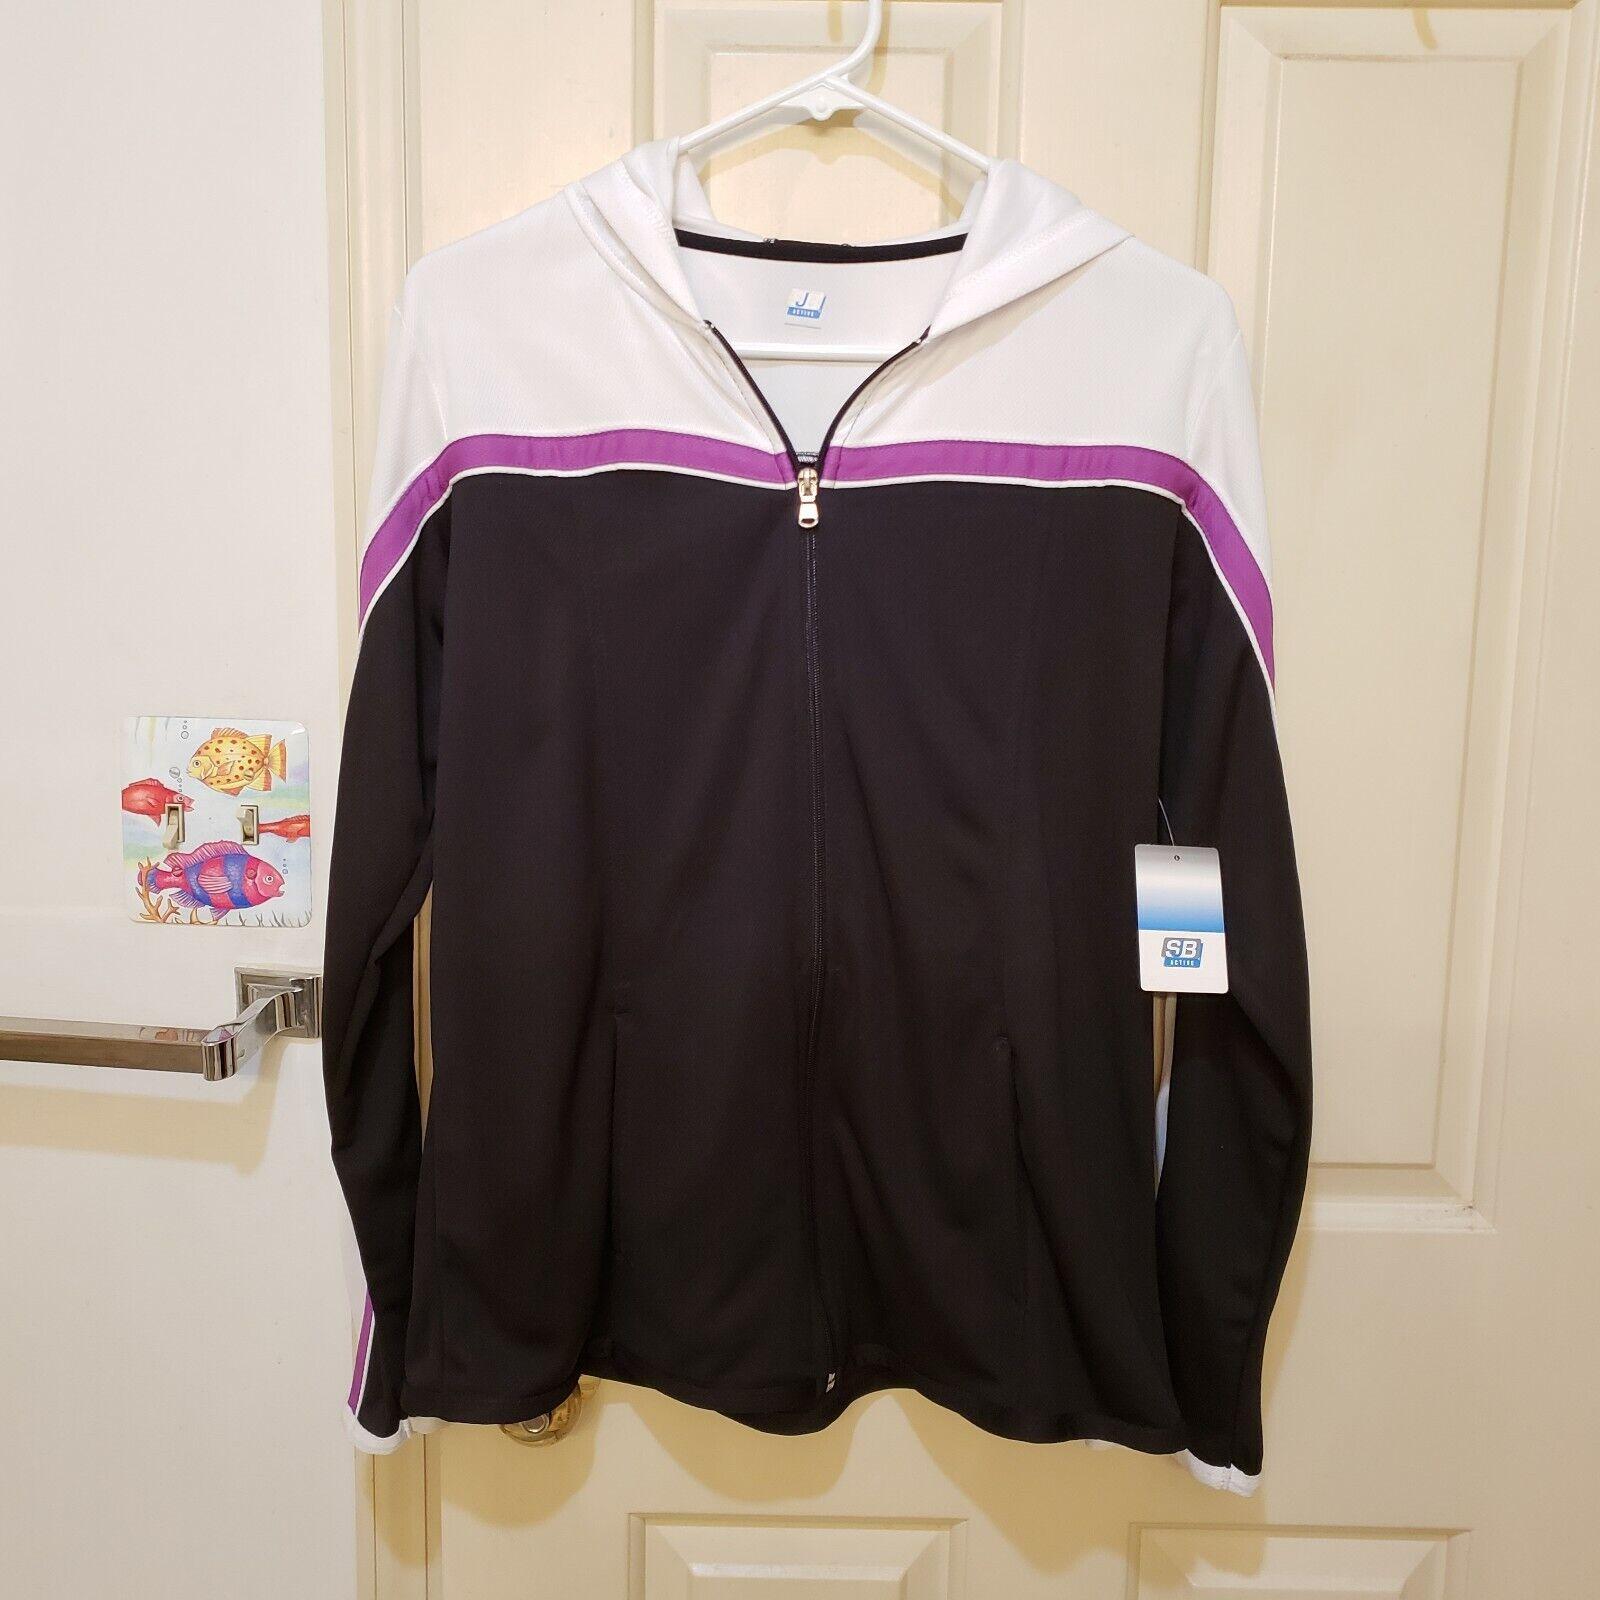 SJB Athletic Casual Zip Front Jacket Hoodie Black Purple Womans Large NWT